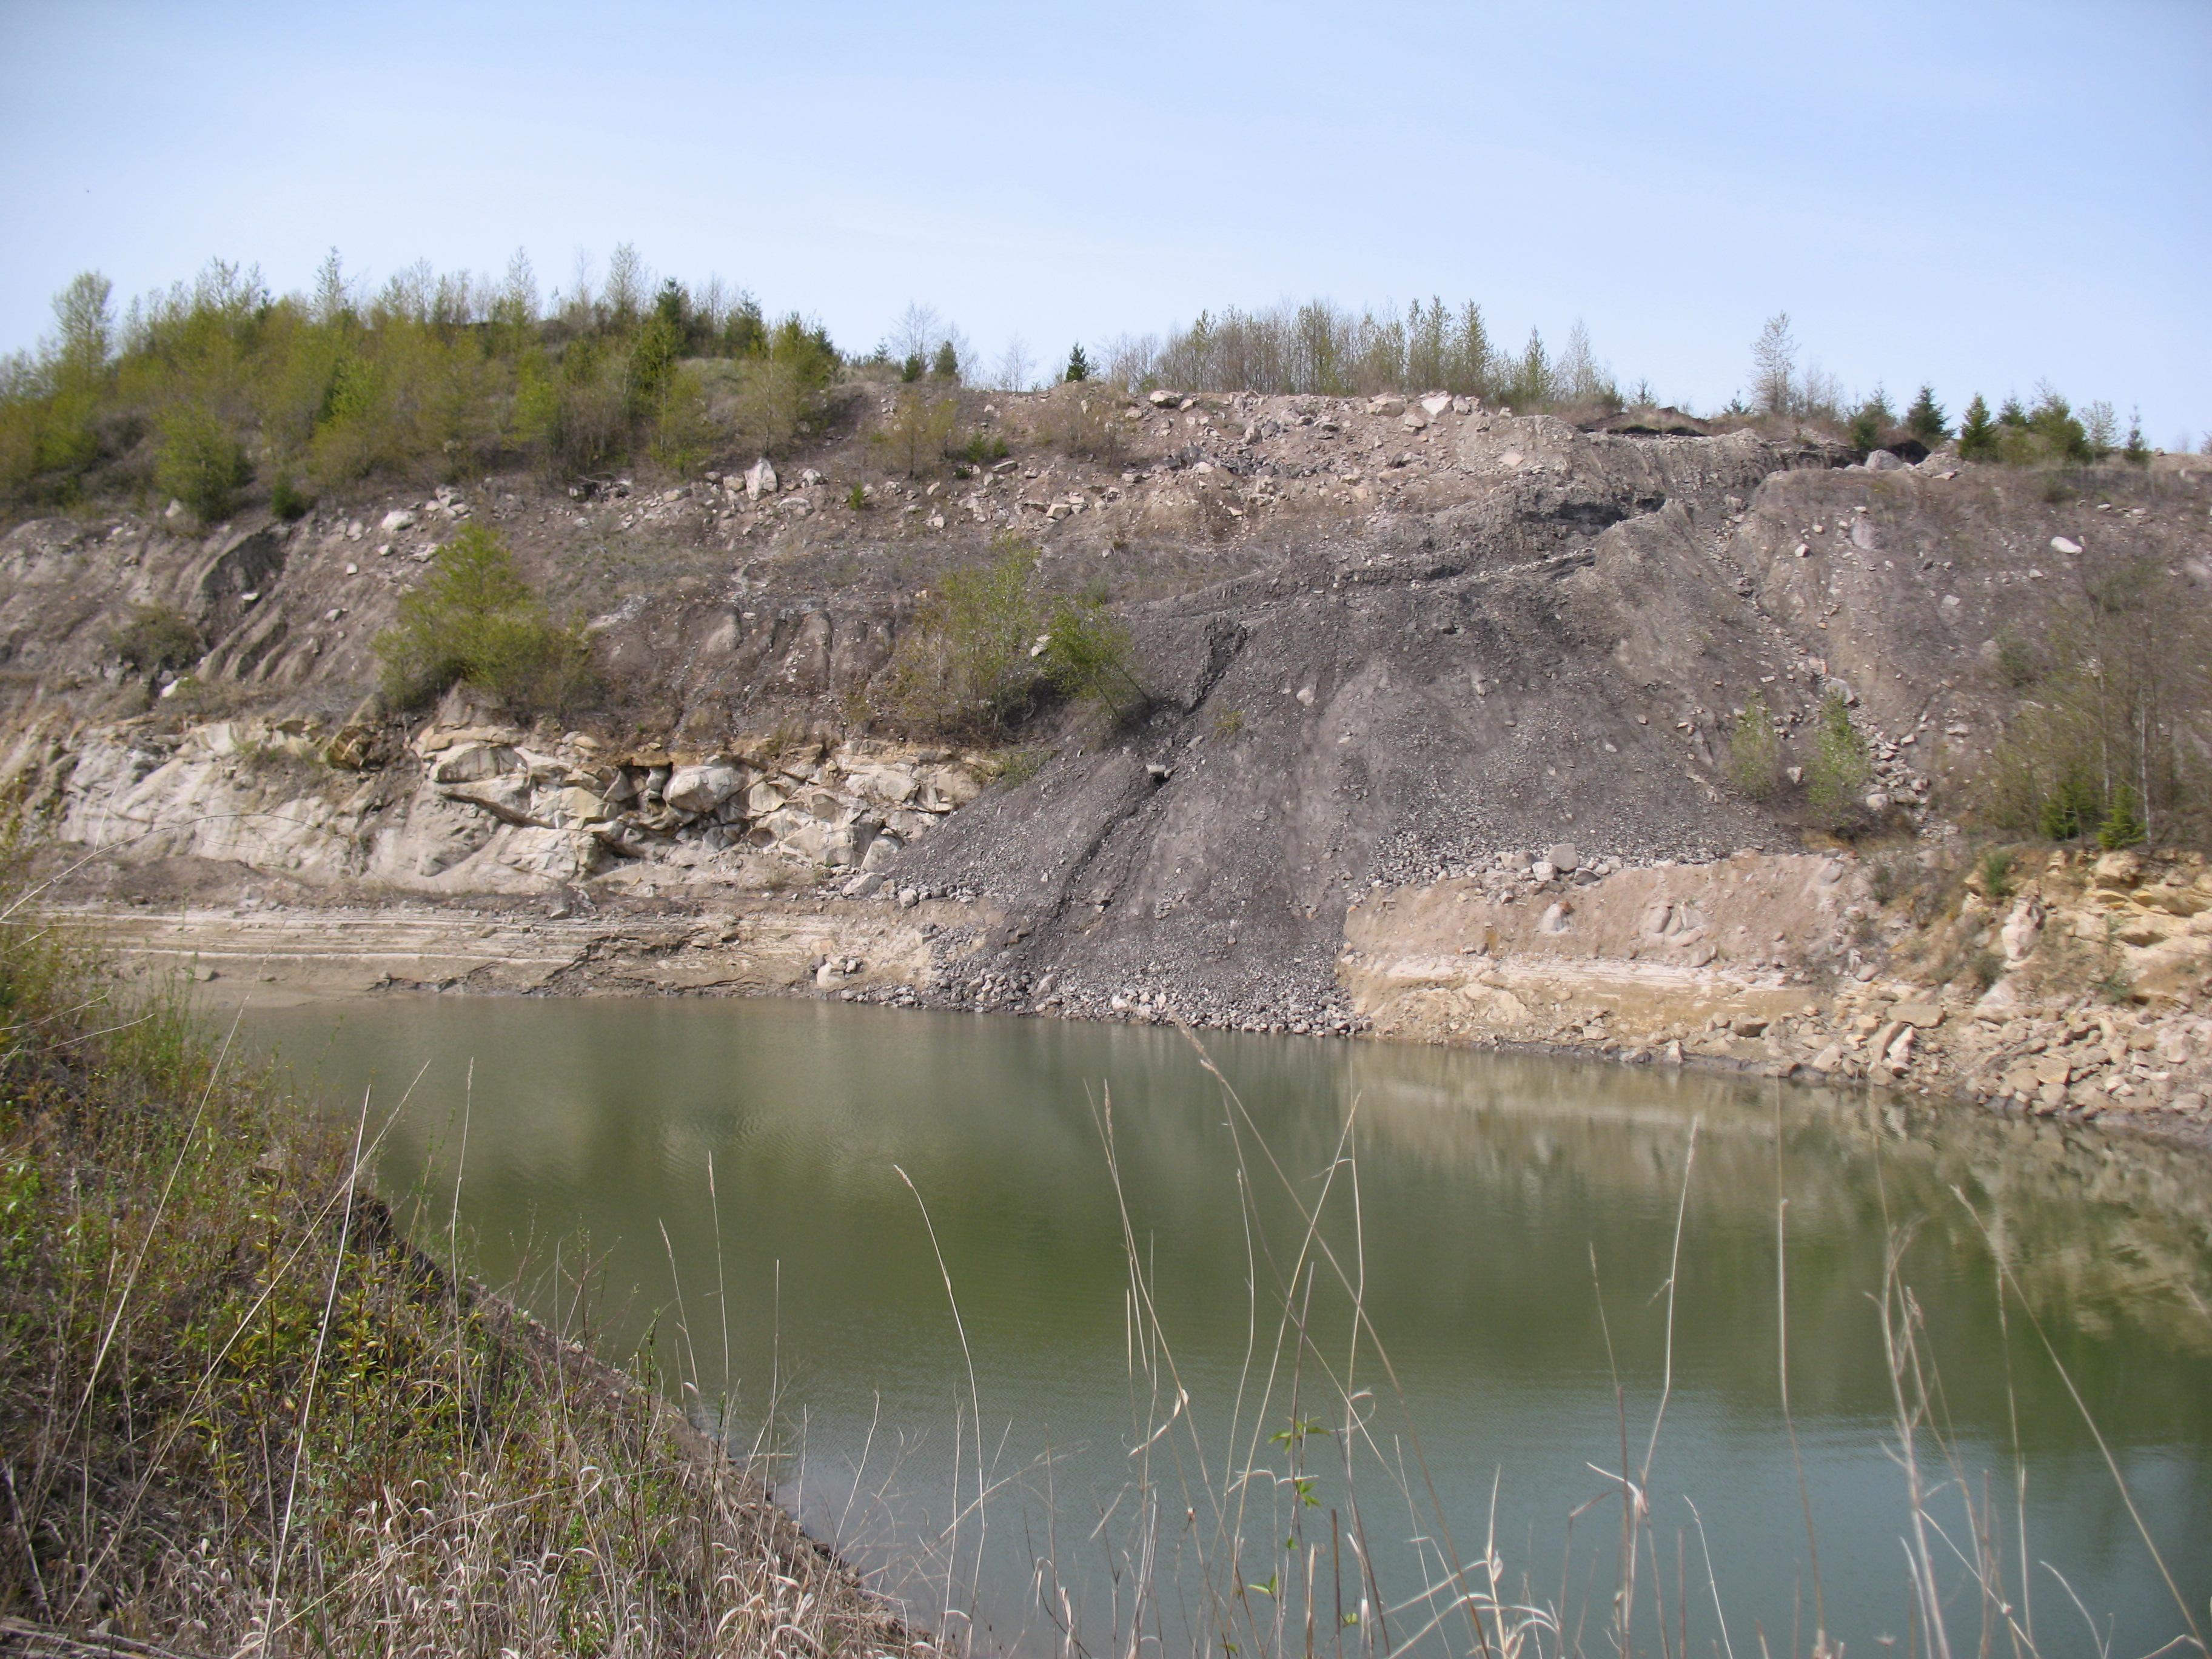 pacific coast coal to resume mining at the john henry no   mine